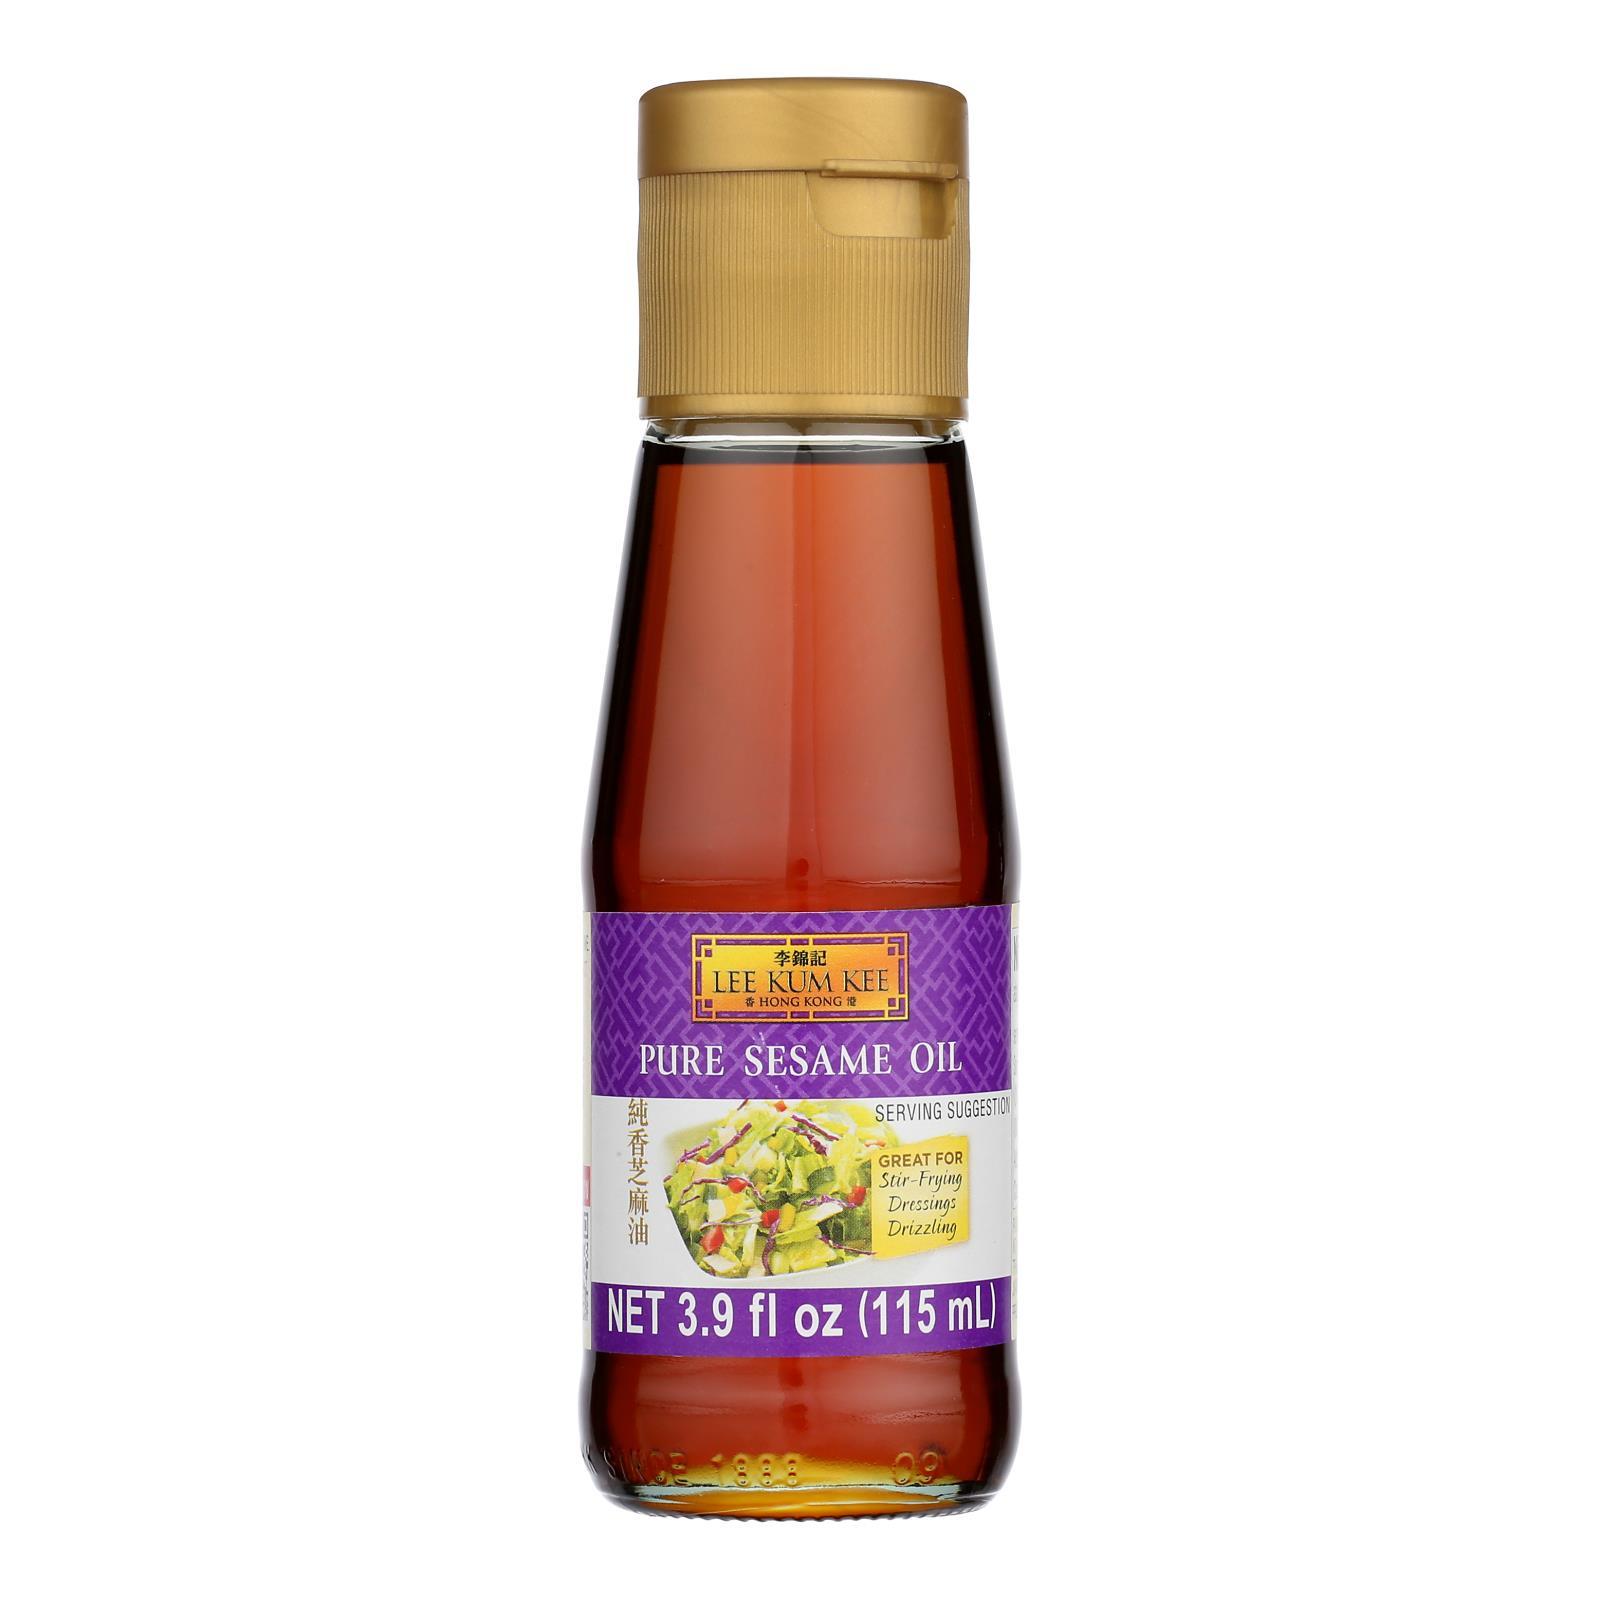 Lee Kum Kee Pure Sesame Oil - Case of 12 - 3.9 FZ